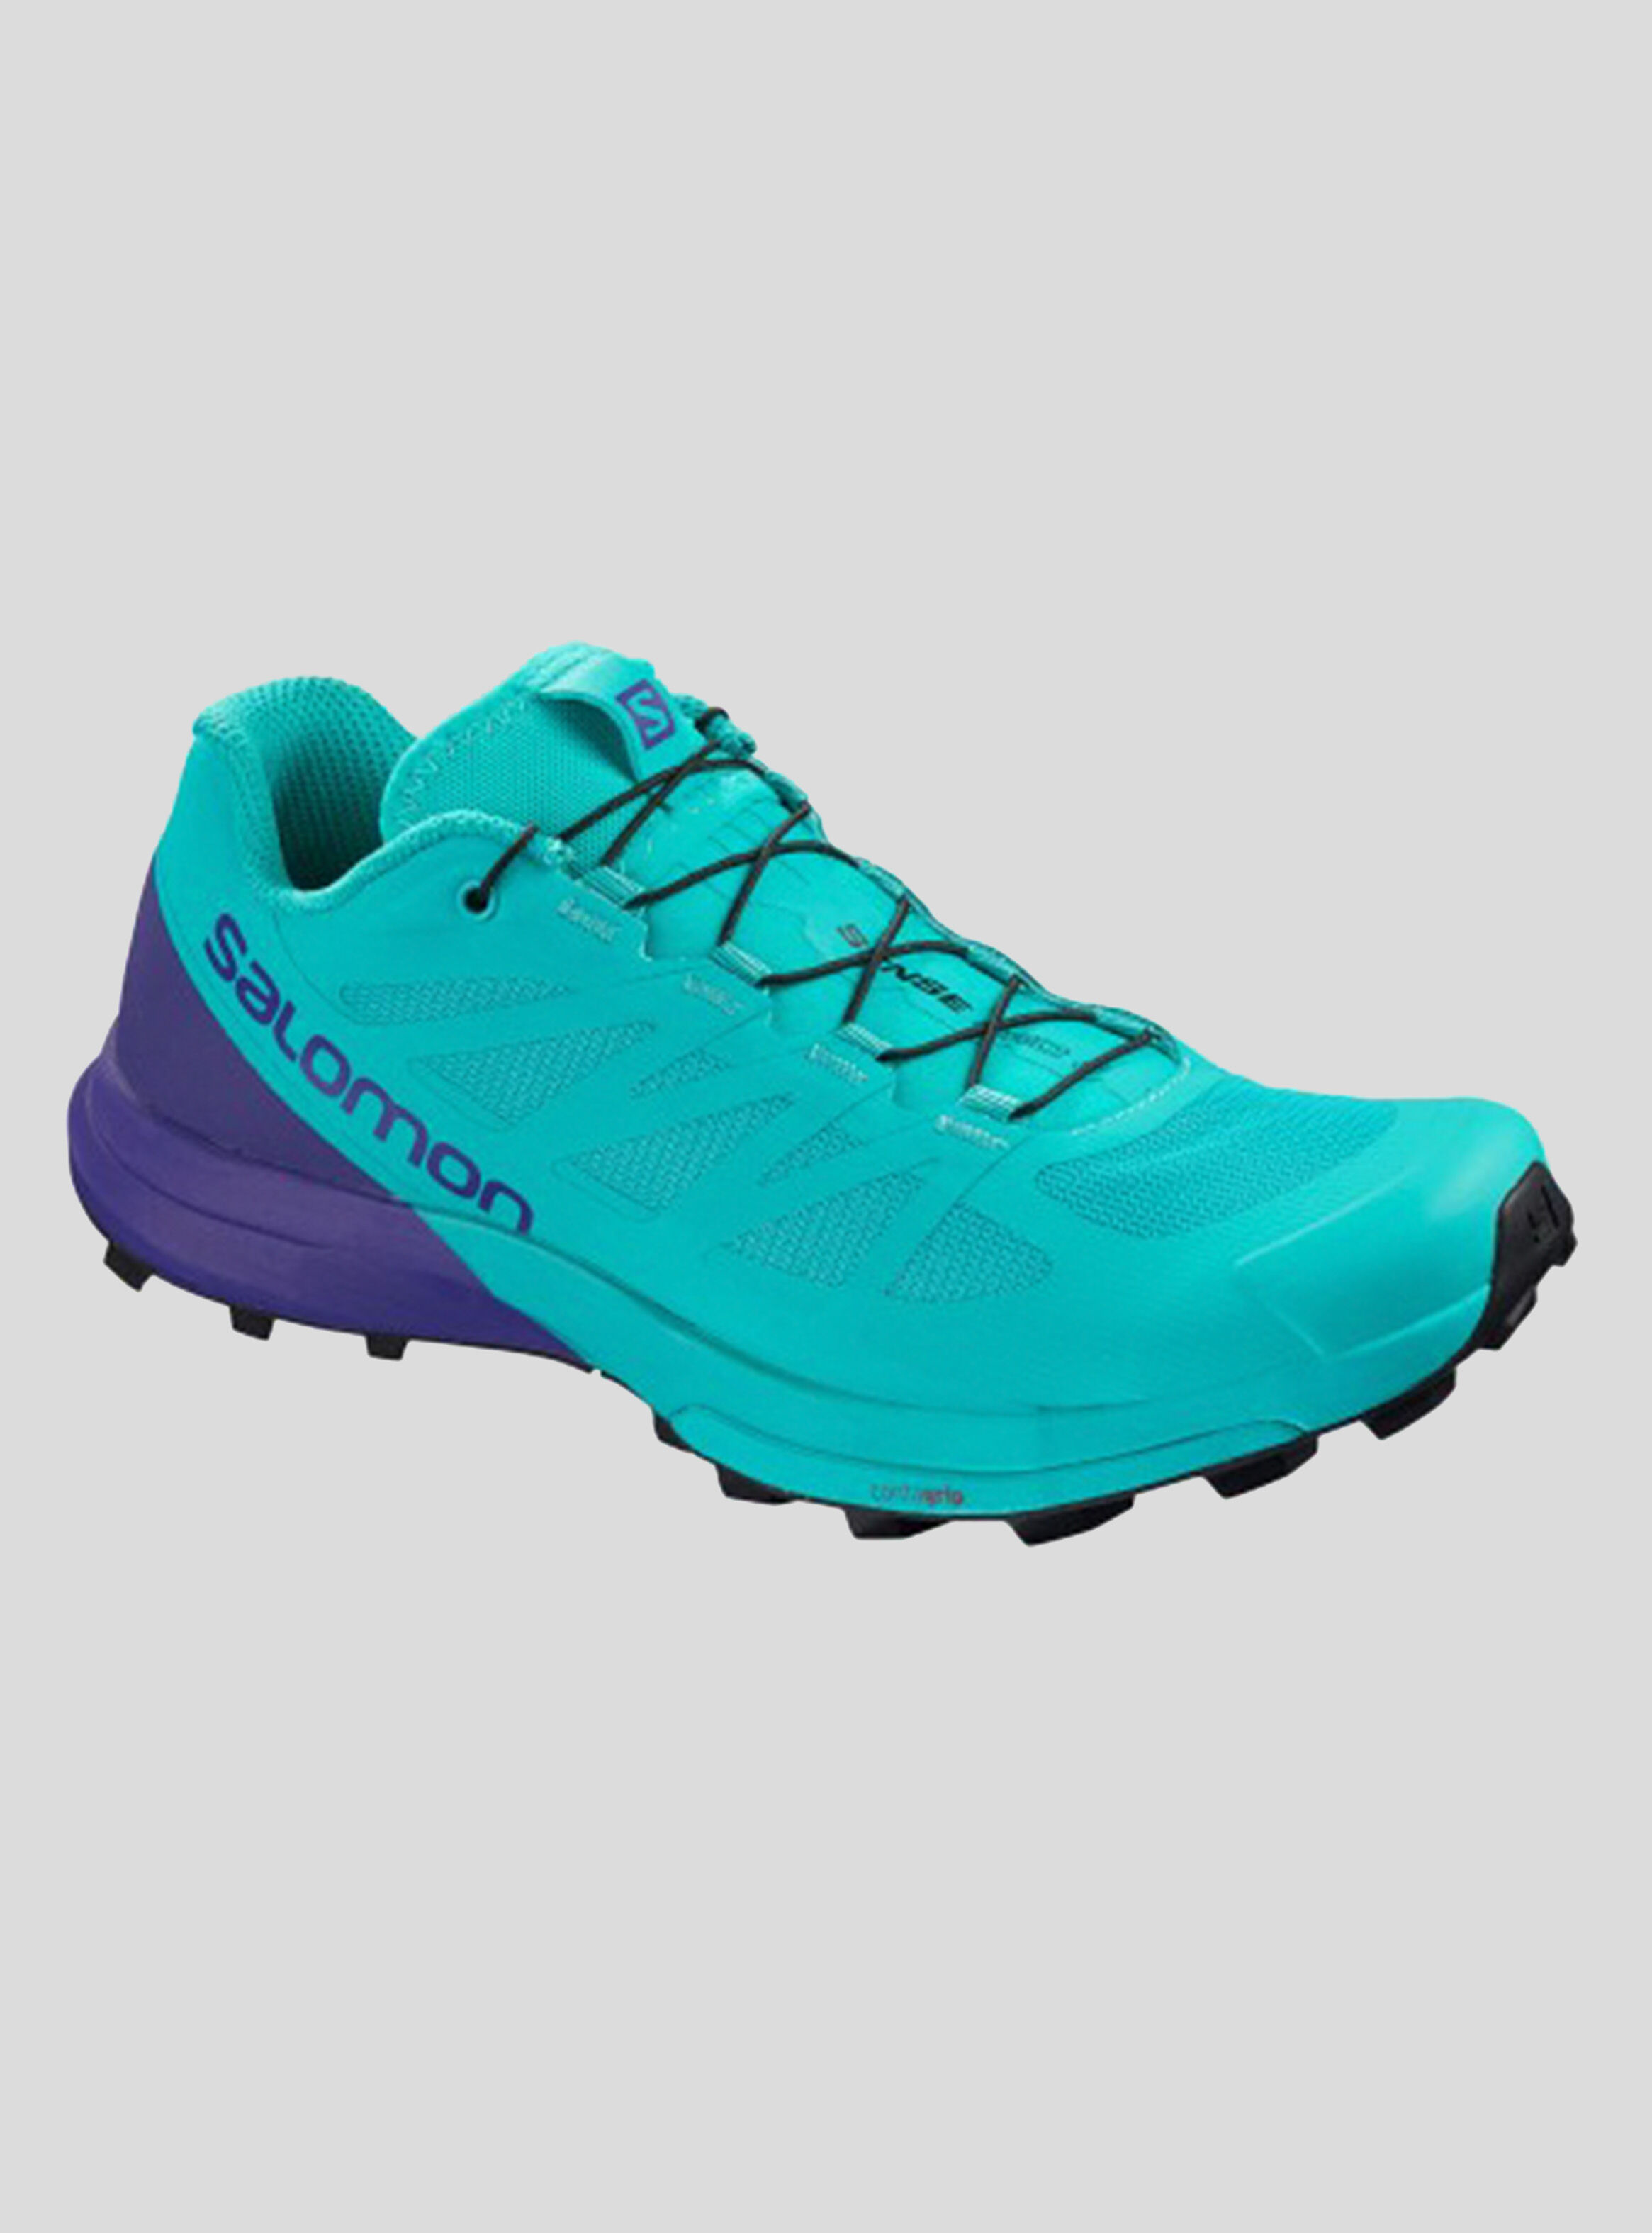 zapatos salomon santiago de chile 30